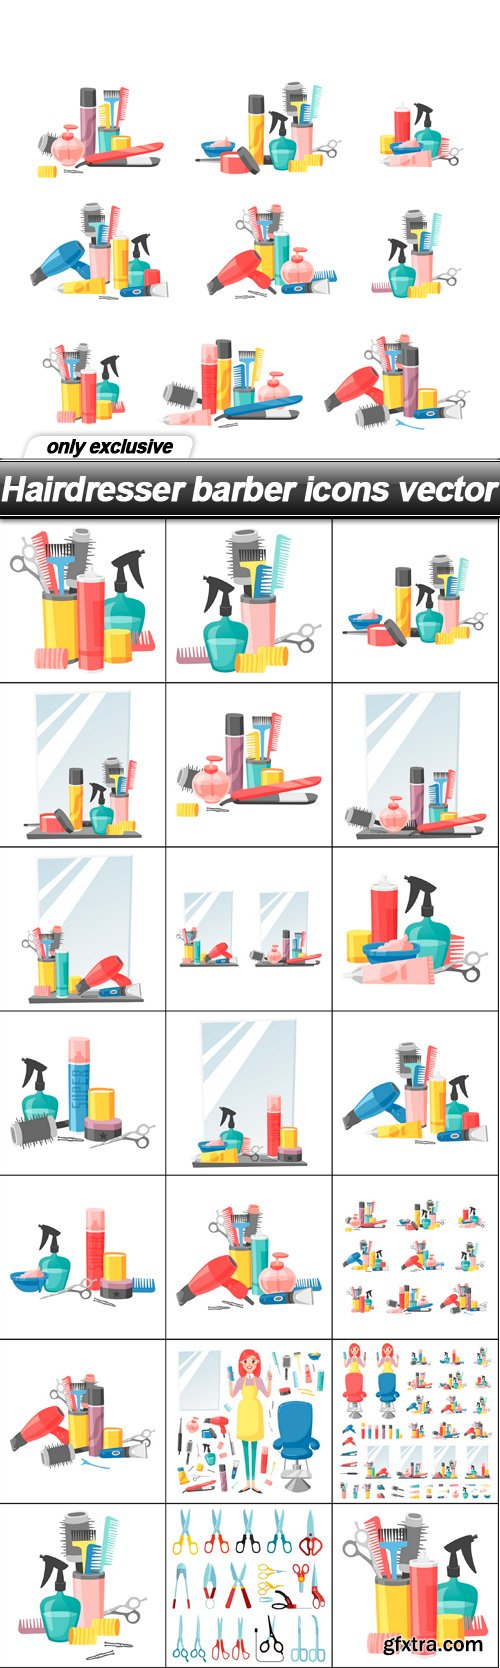 Hairdresser barber icons vector - 20 EPS